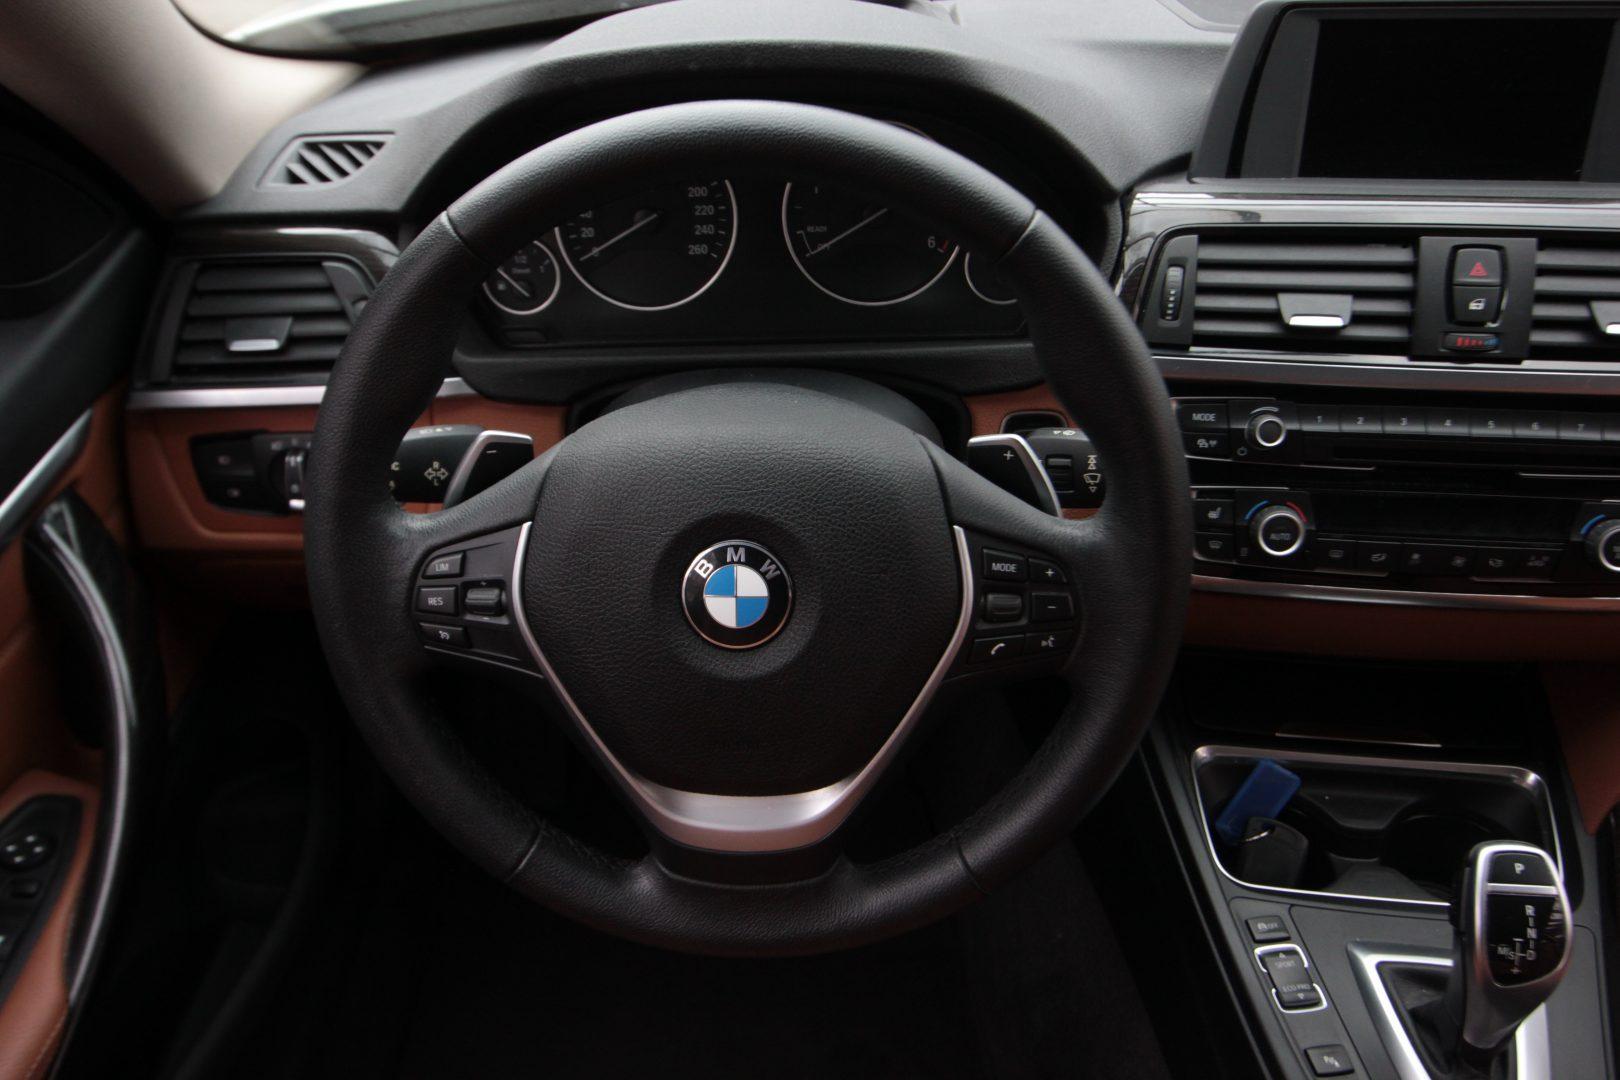 AIL BMW 430d 11